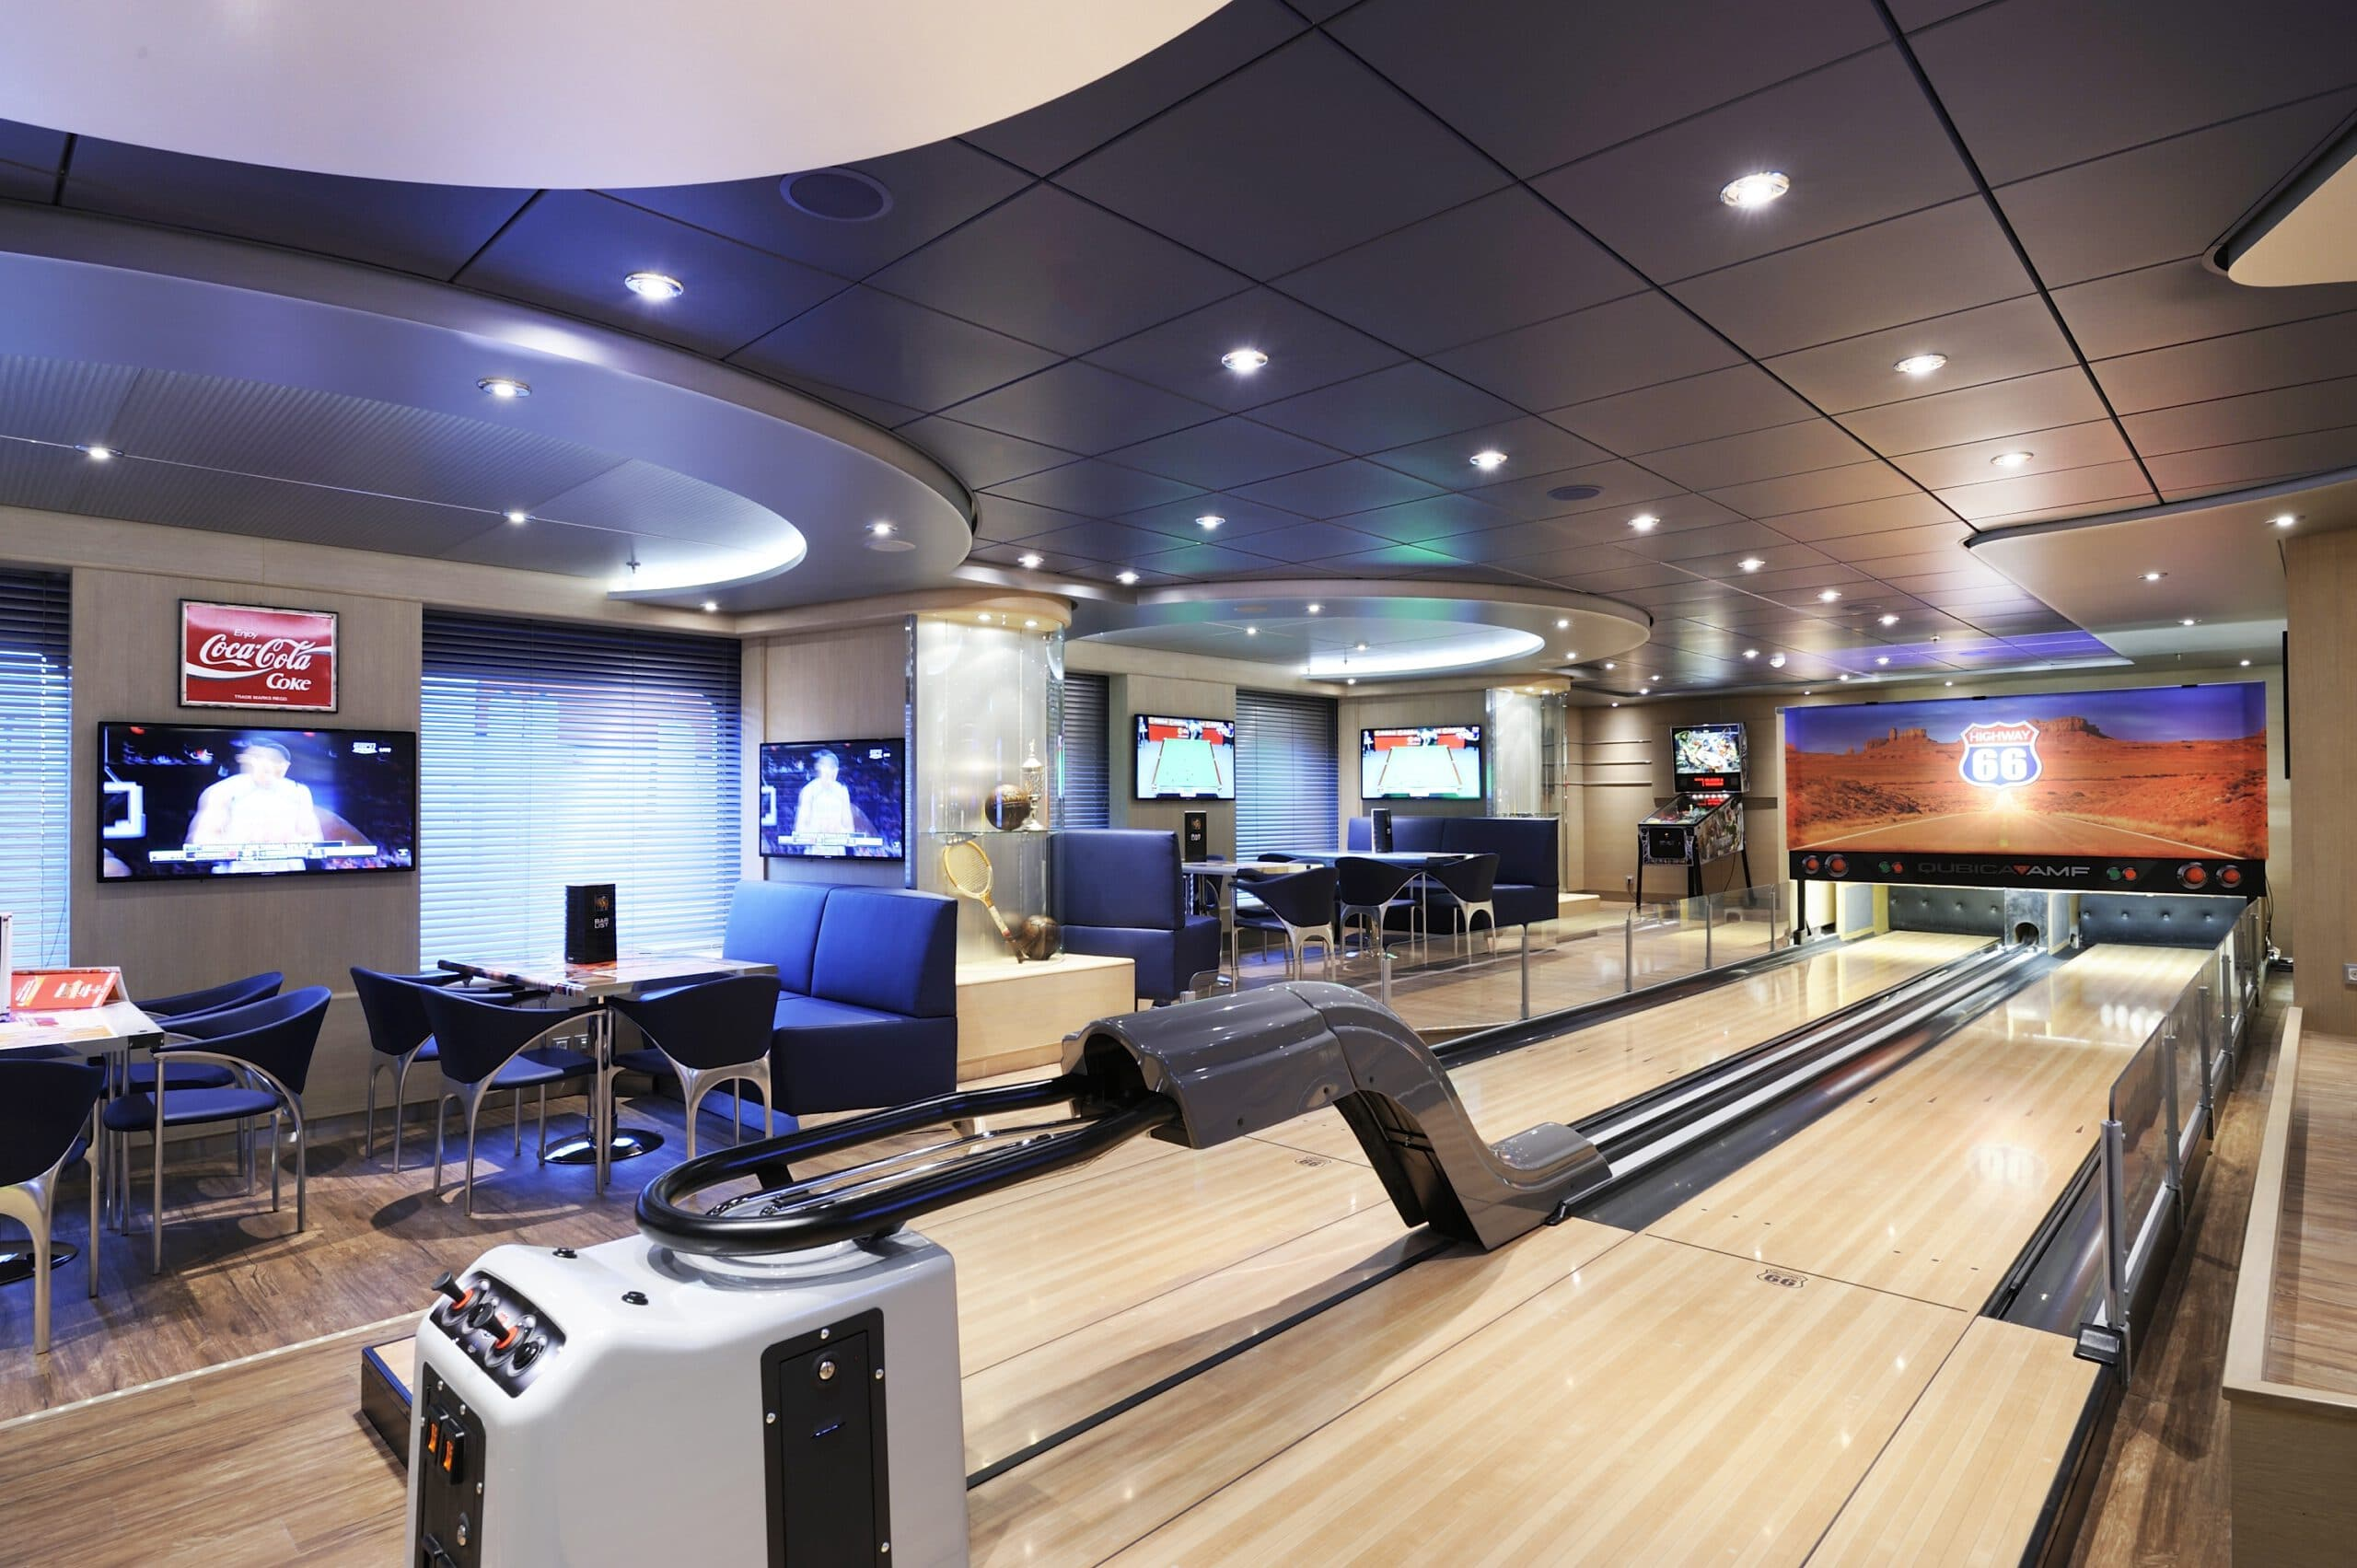 Cruiseschip-MSC Preziosa-MSC Cruises-Bowling